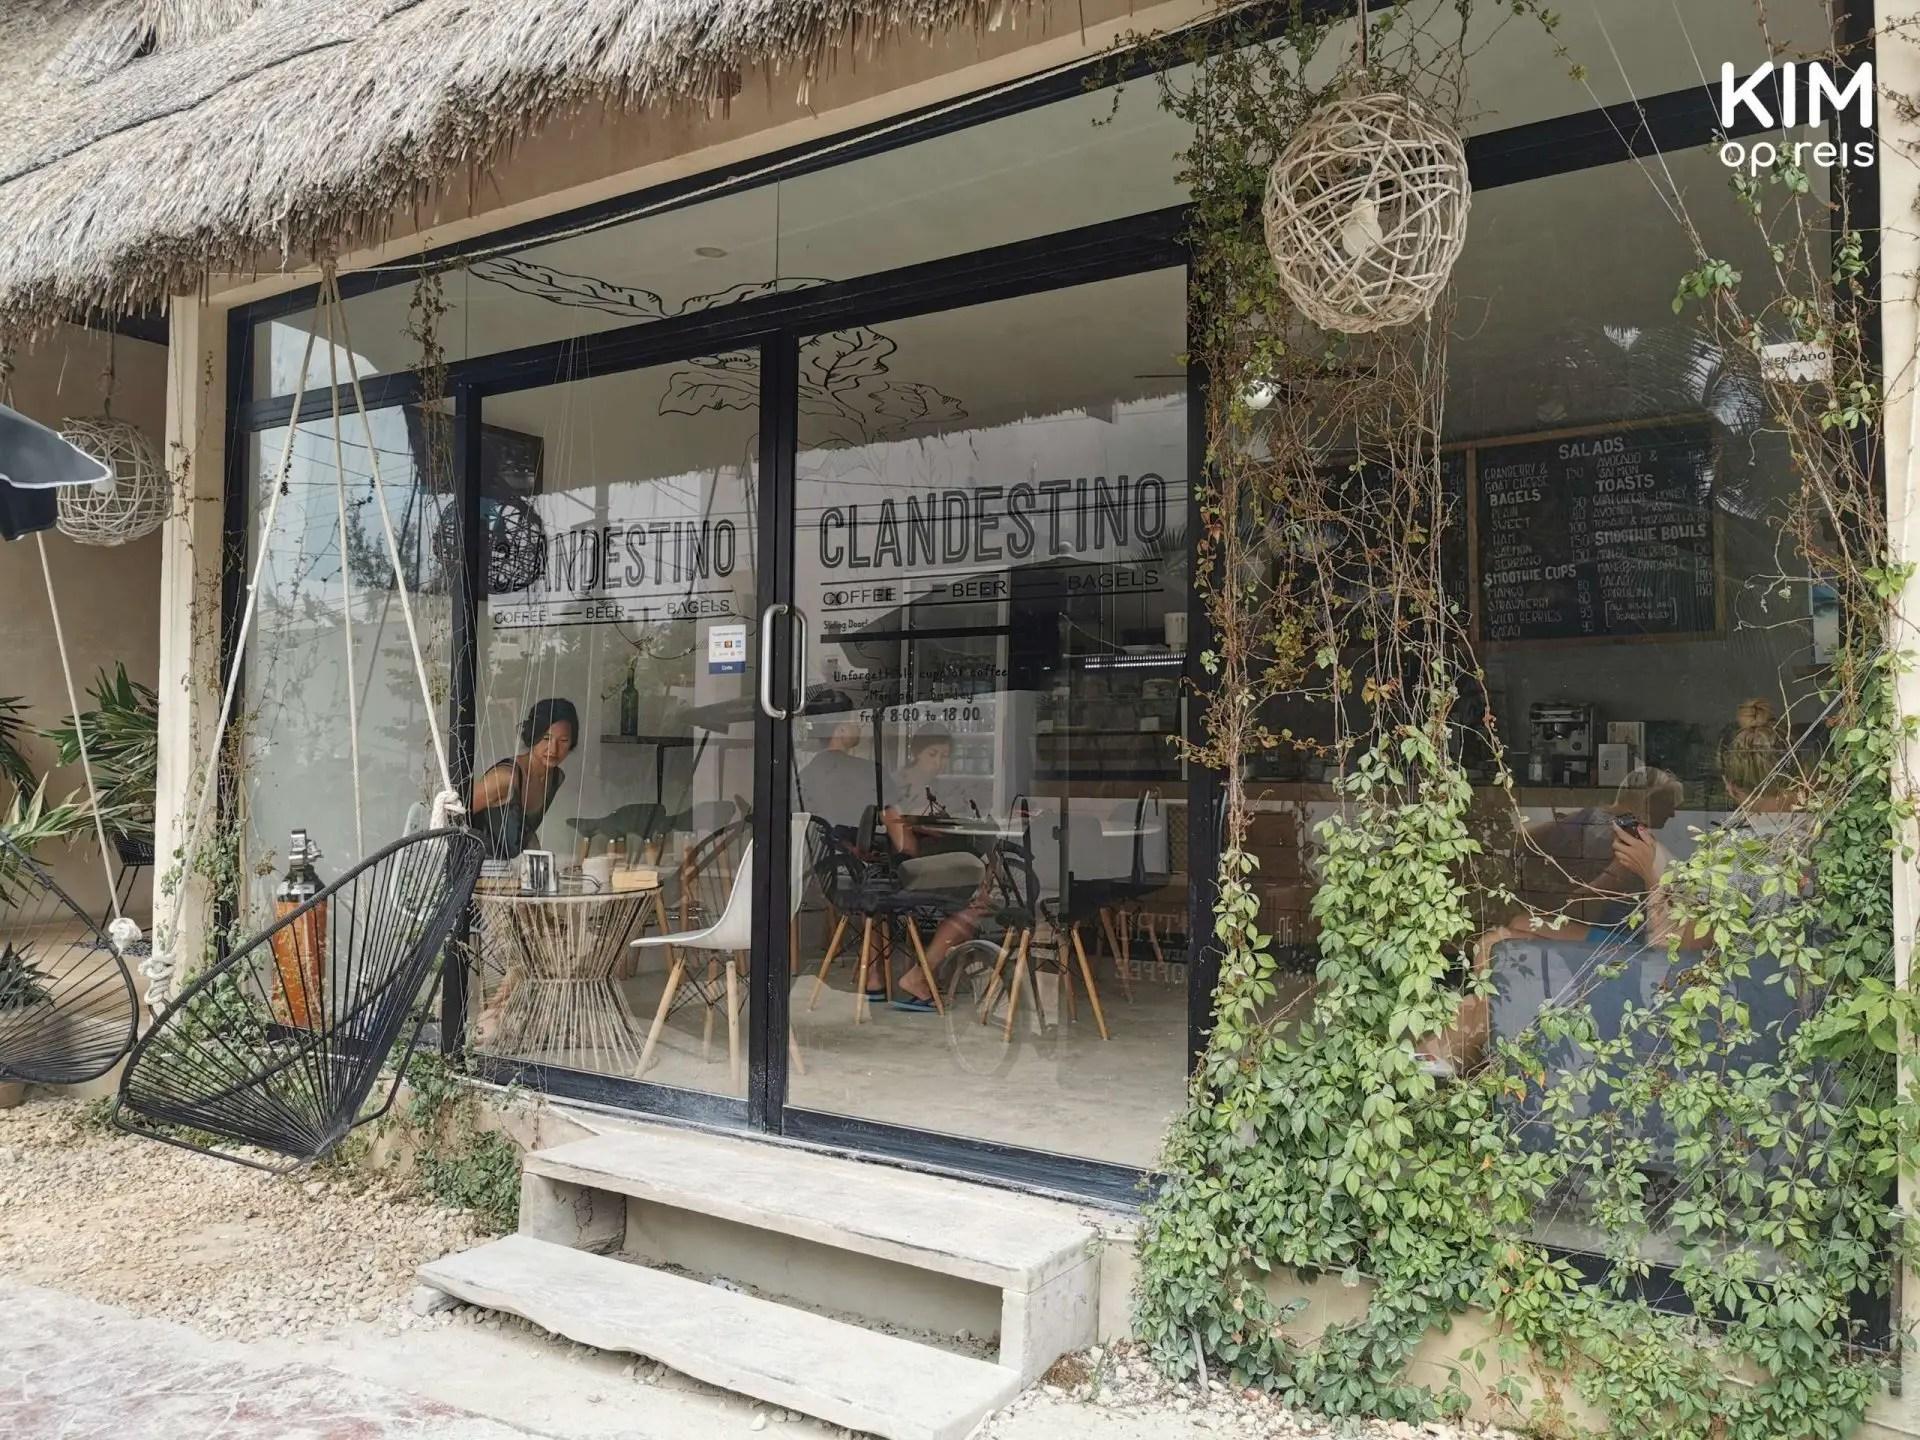 Isla Holbox Clandestino voorkant: entree van restaurant Clandestino